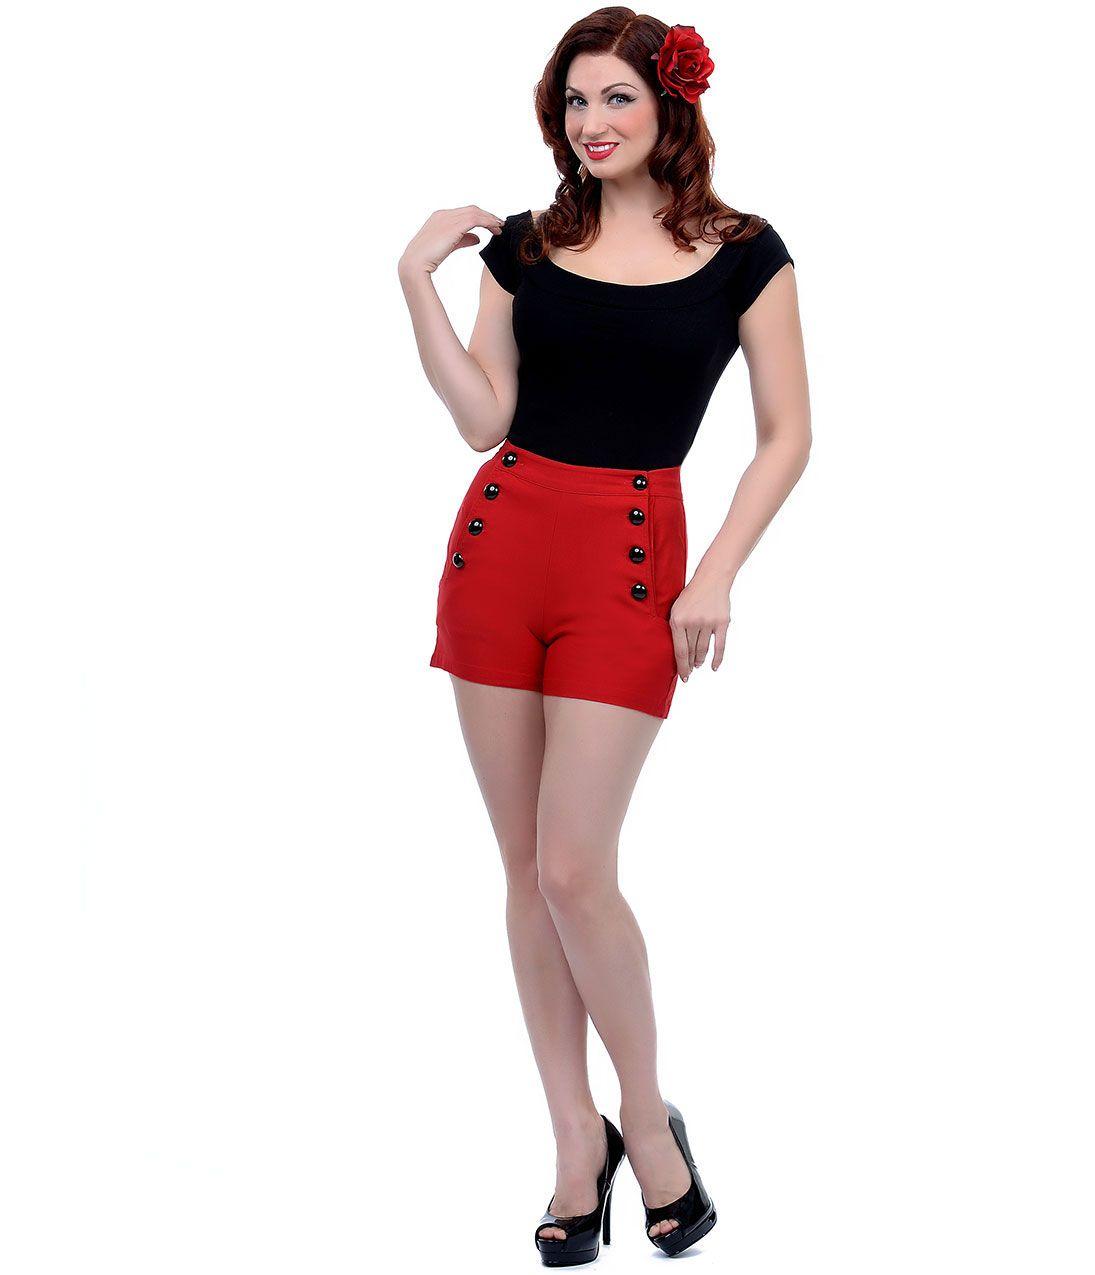 50s style shorts